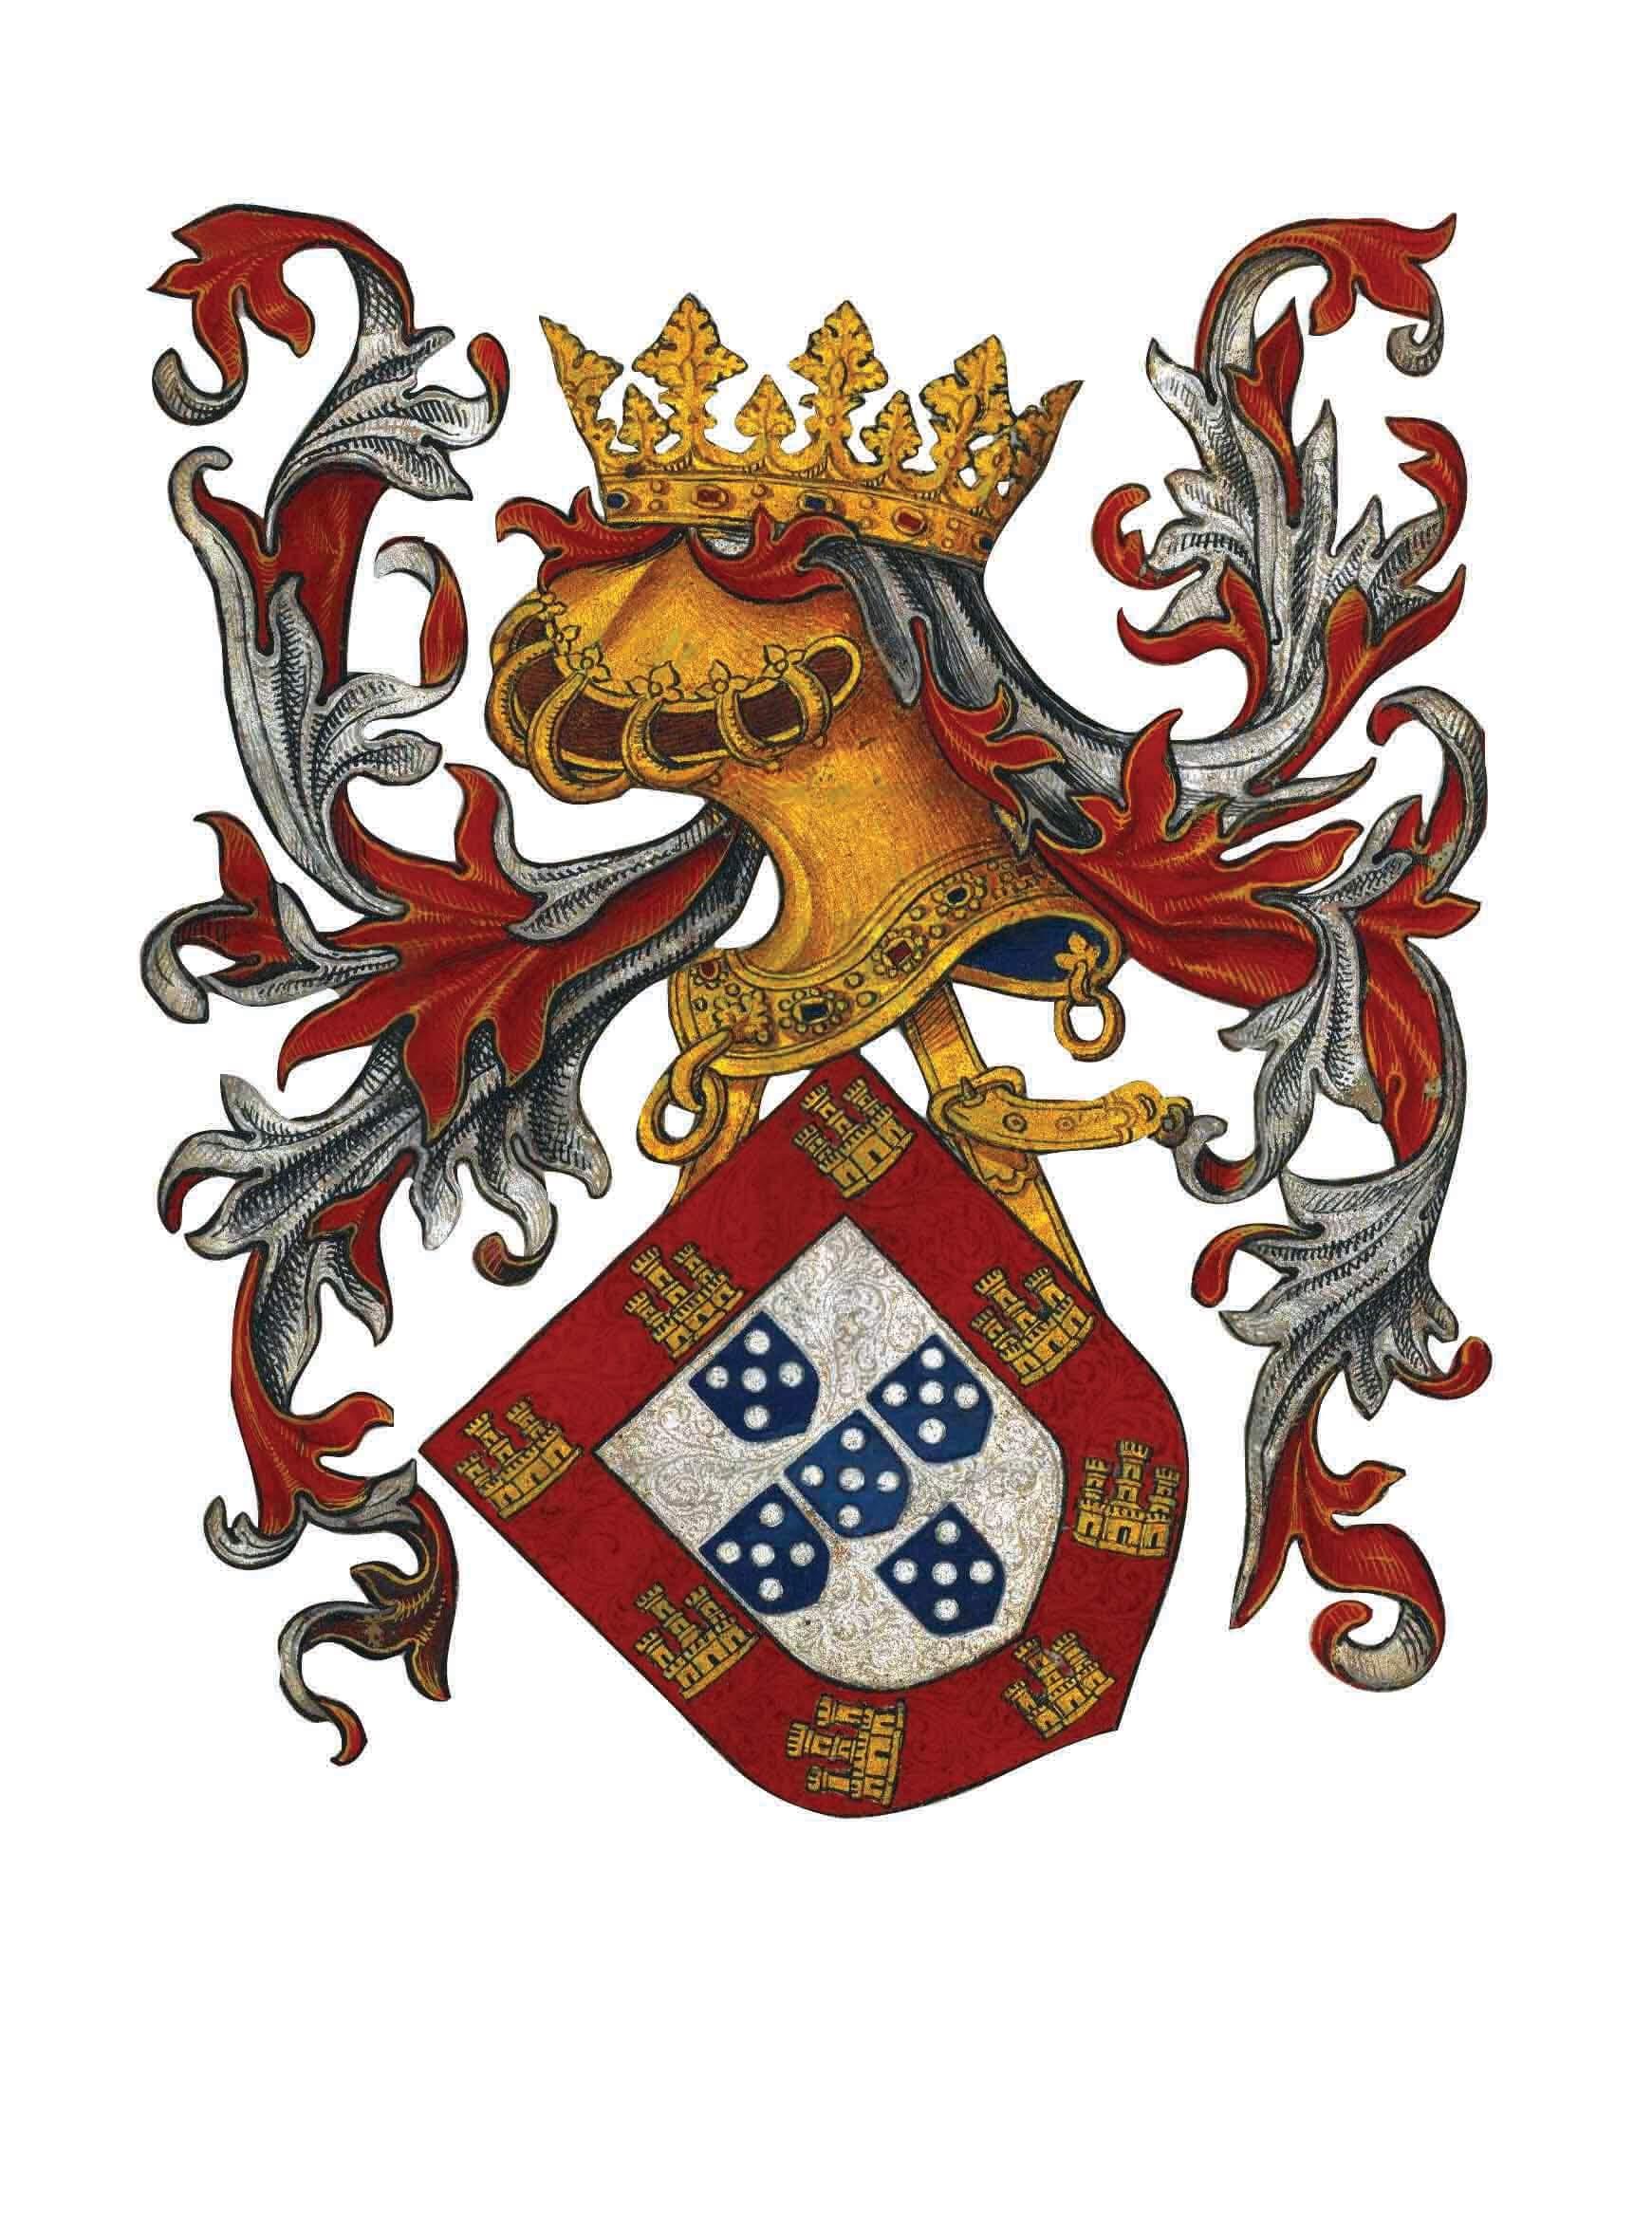 Portuguese royal armor.